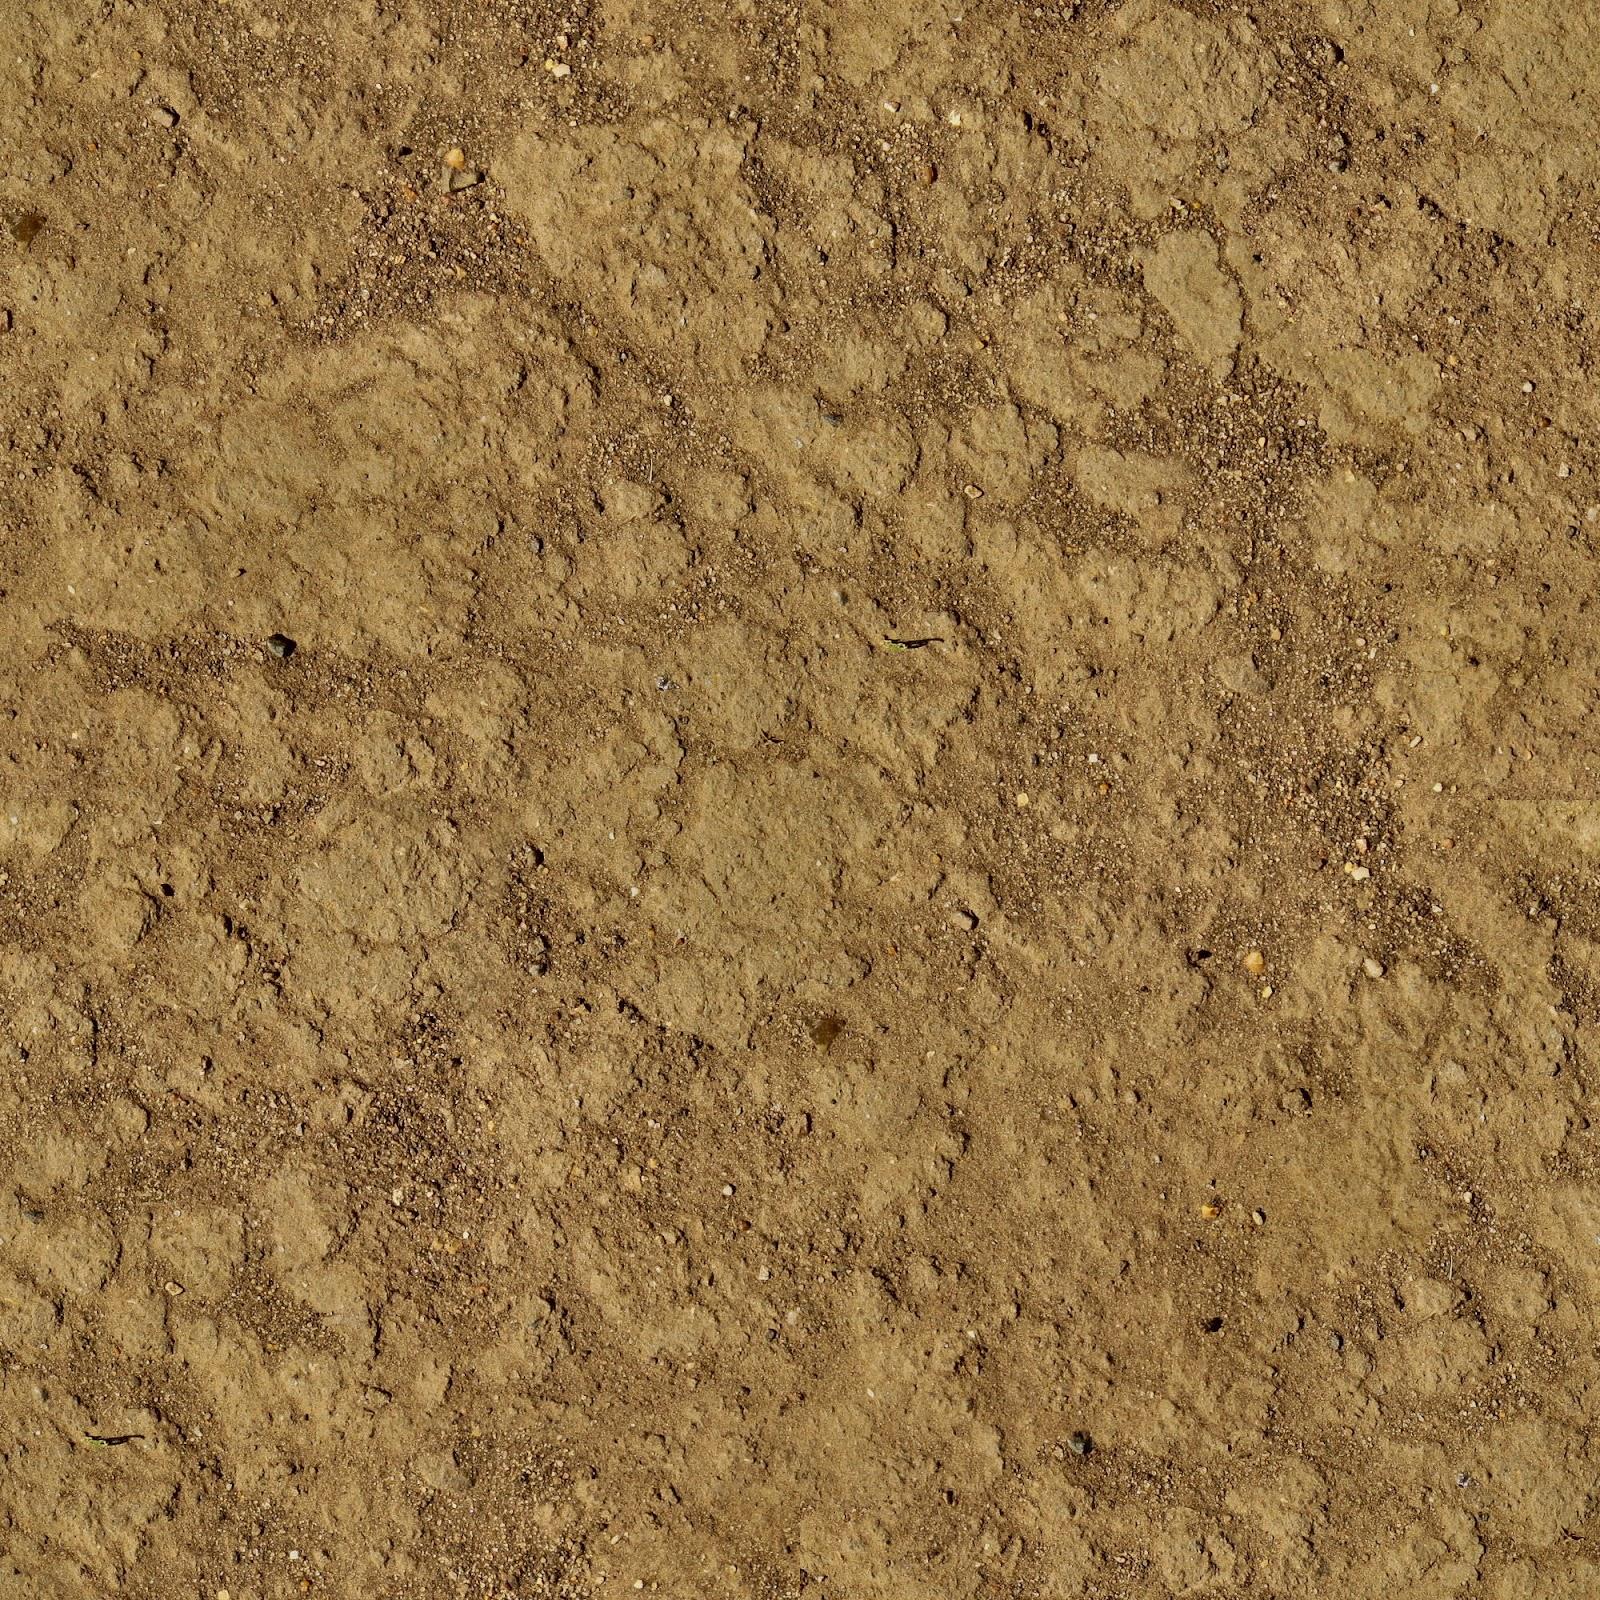 Flooring For Dirt Floor: FMP: Texture Research